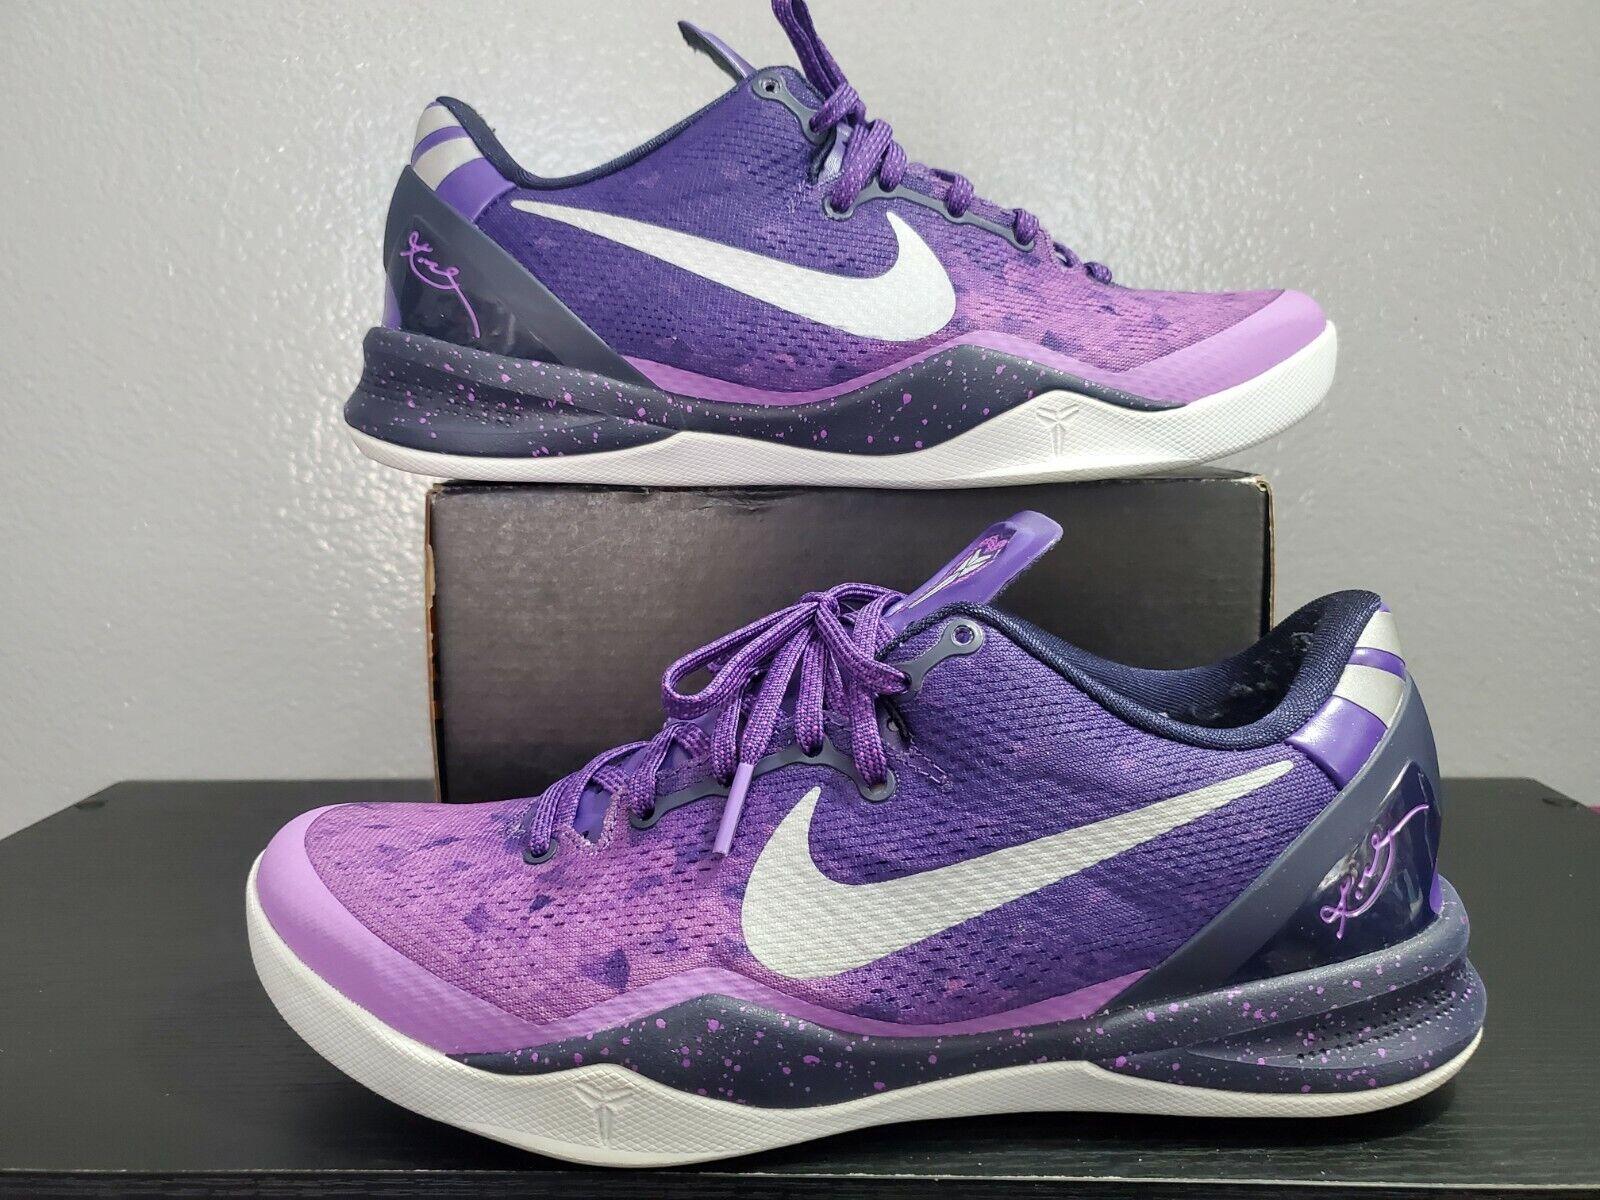 nike kobe 8 system 555035 500 sz 9.5 purple fade gradient playoff